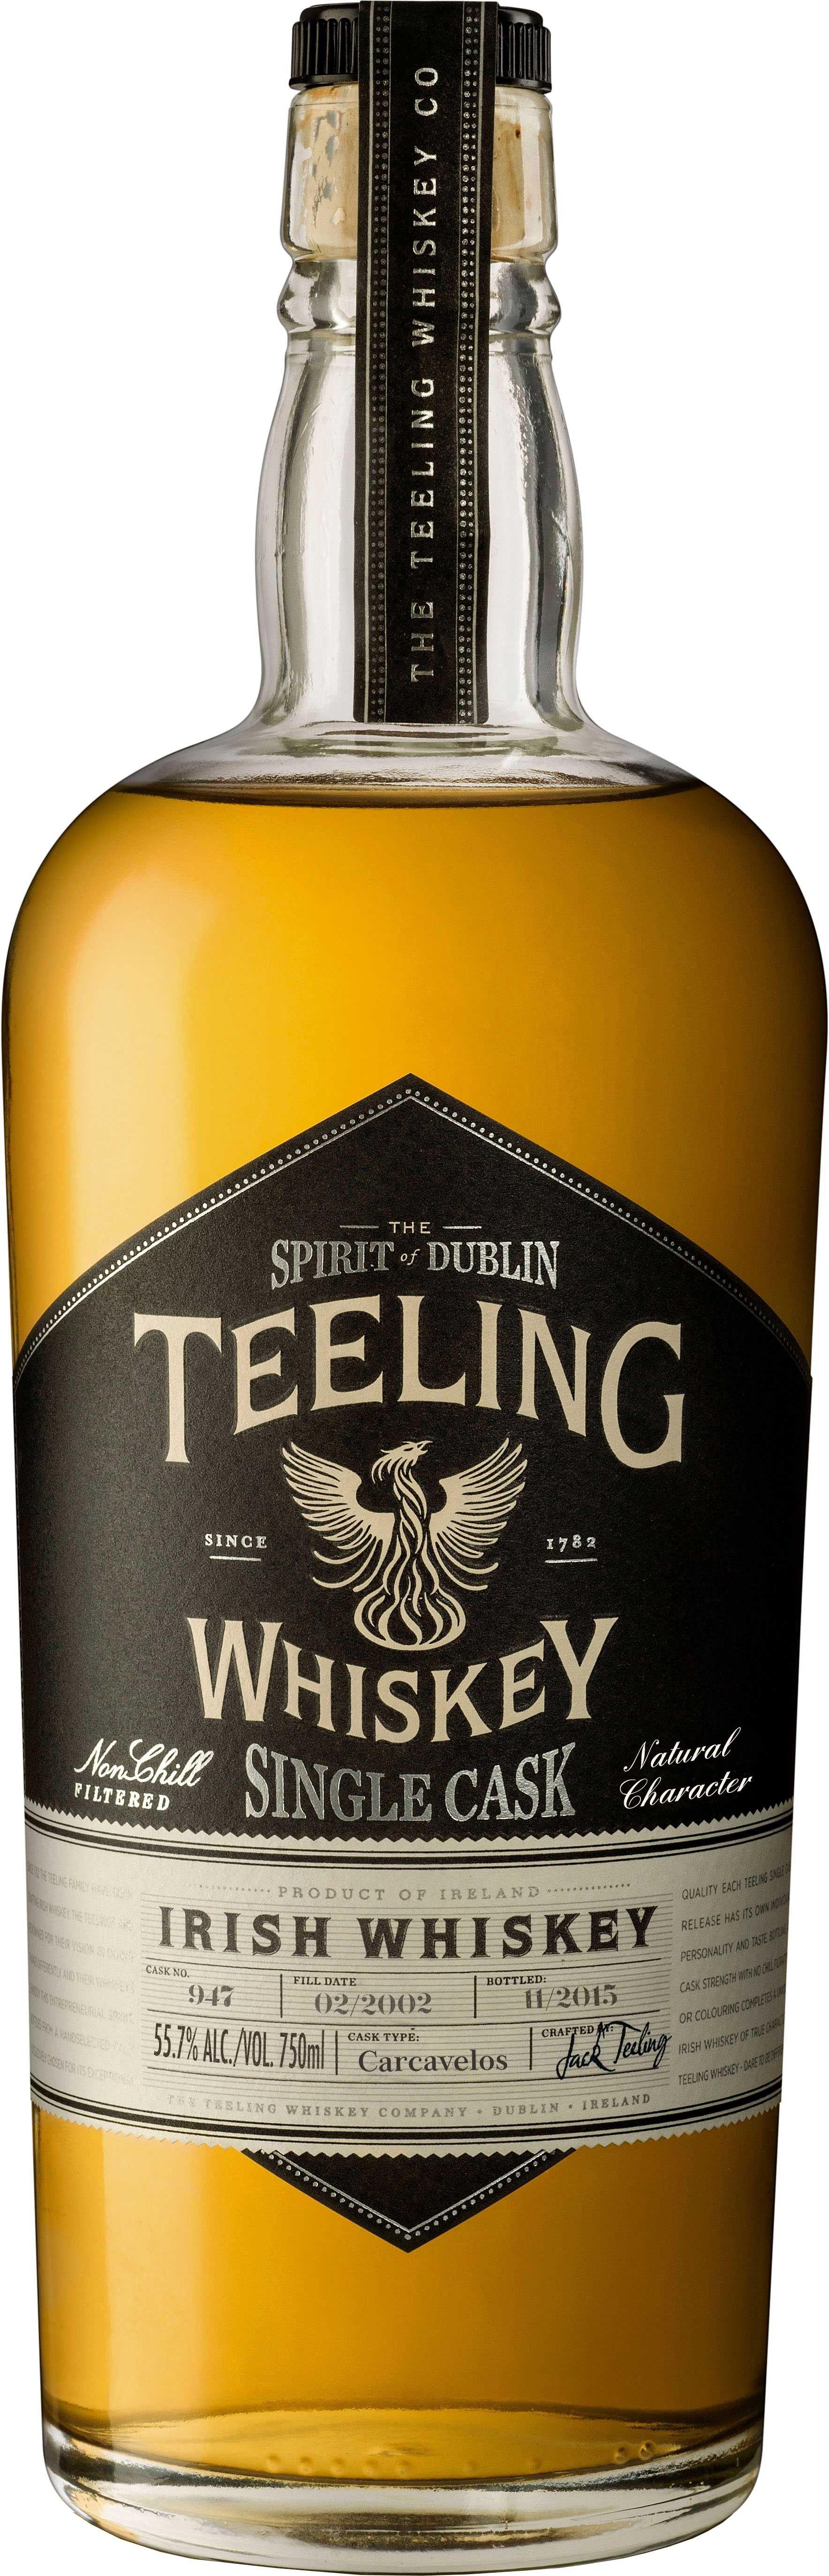 Teeling Carcavelos Barrel Aged Single Cask Irish Whiskey